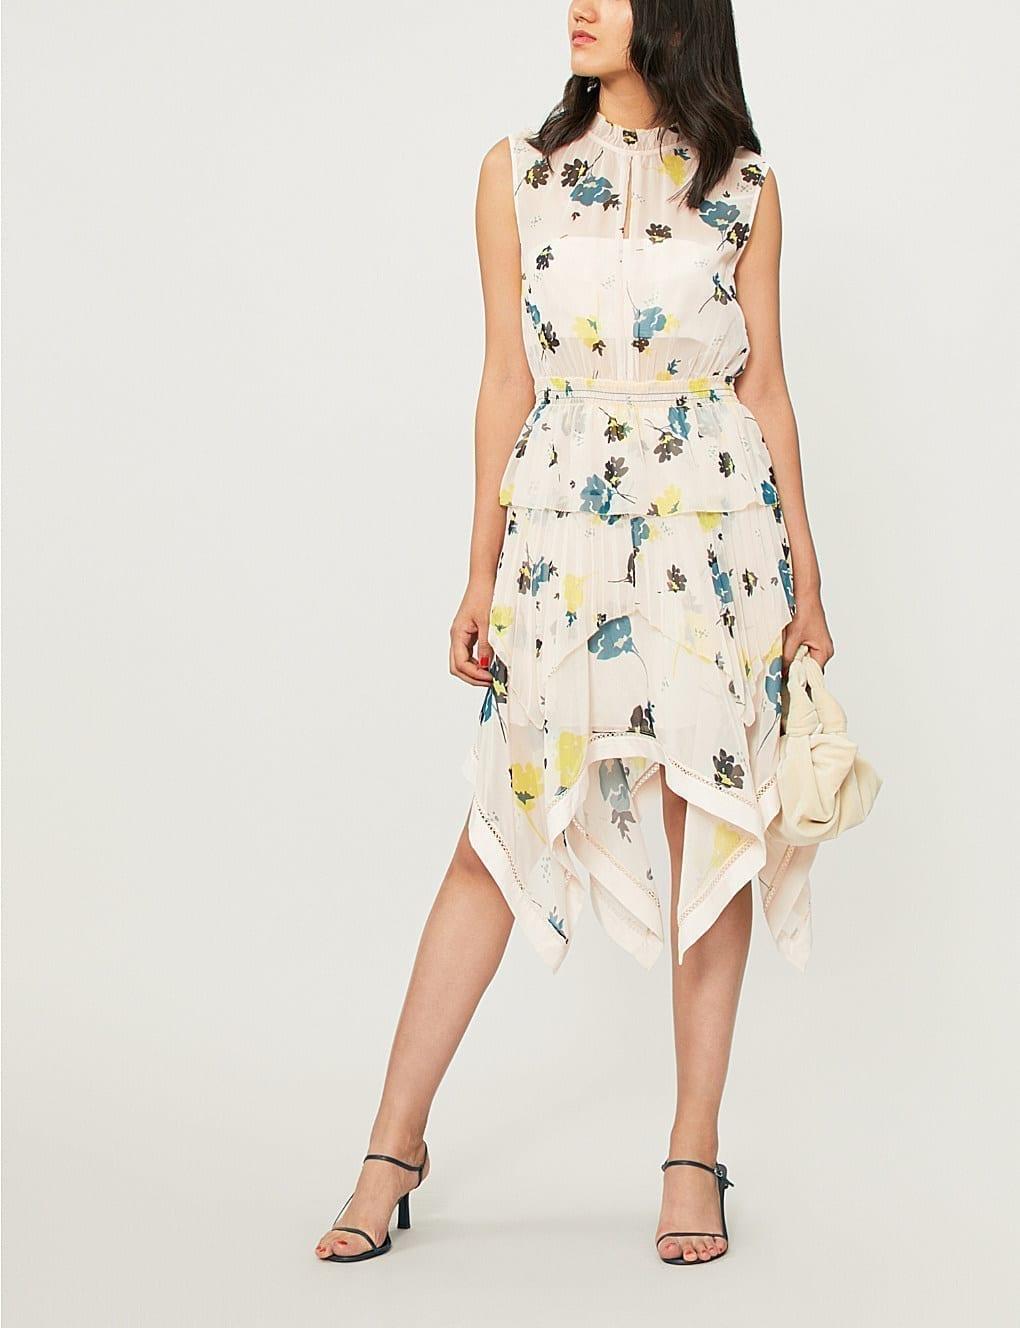 47ad4100a0e8 SELF-PORTRAIT Asymmetric Graphic Chiffon Nude / Floral Printed Dress ...